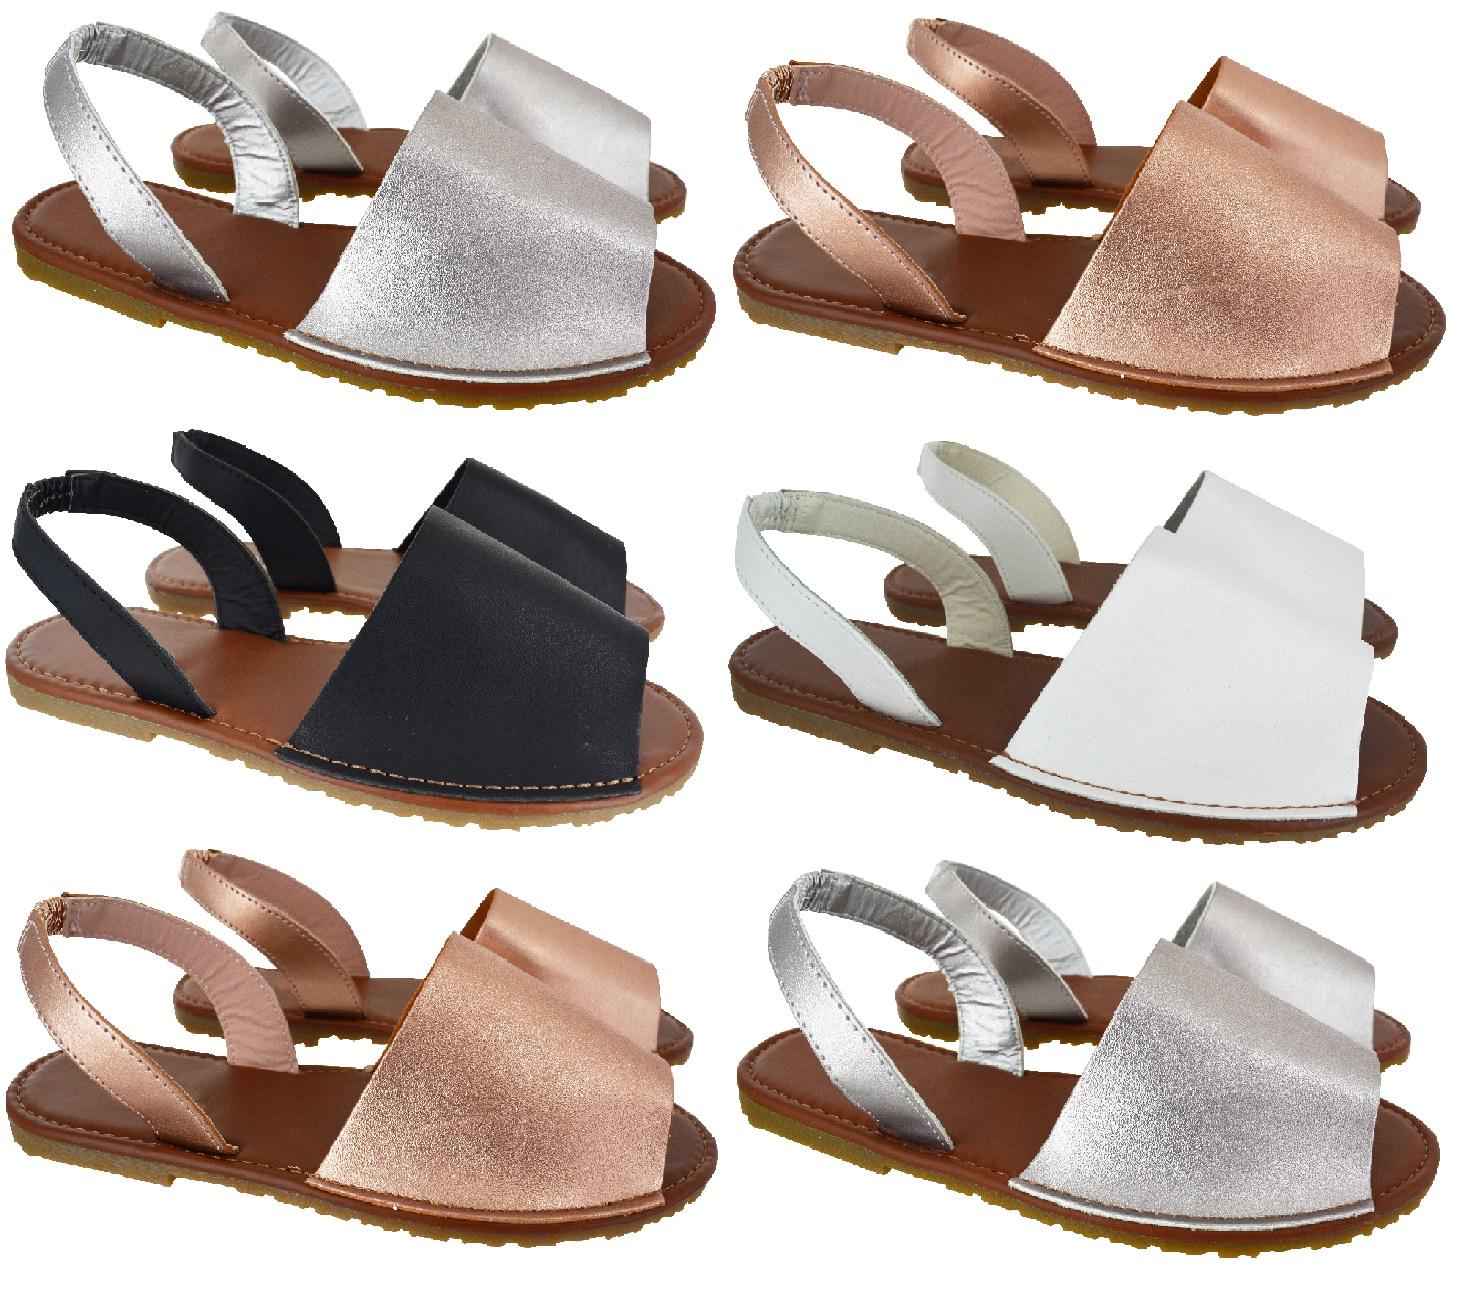 Sandals shoes summer - Ladies Womens Summer Menorcan Flat Slingback Open Toe Spanish Sandals Shoes Sz